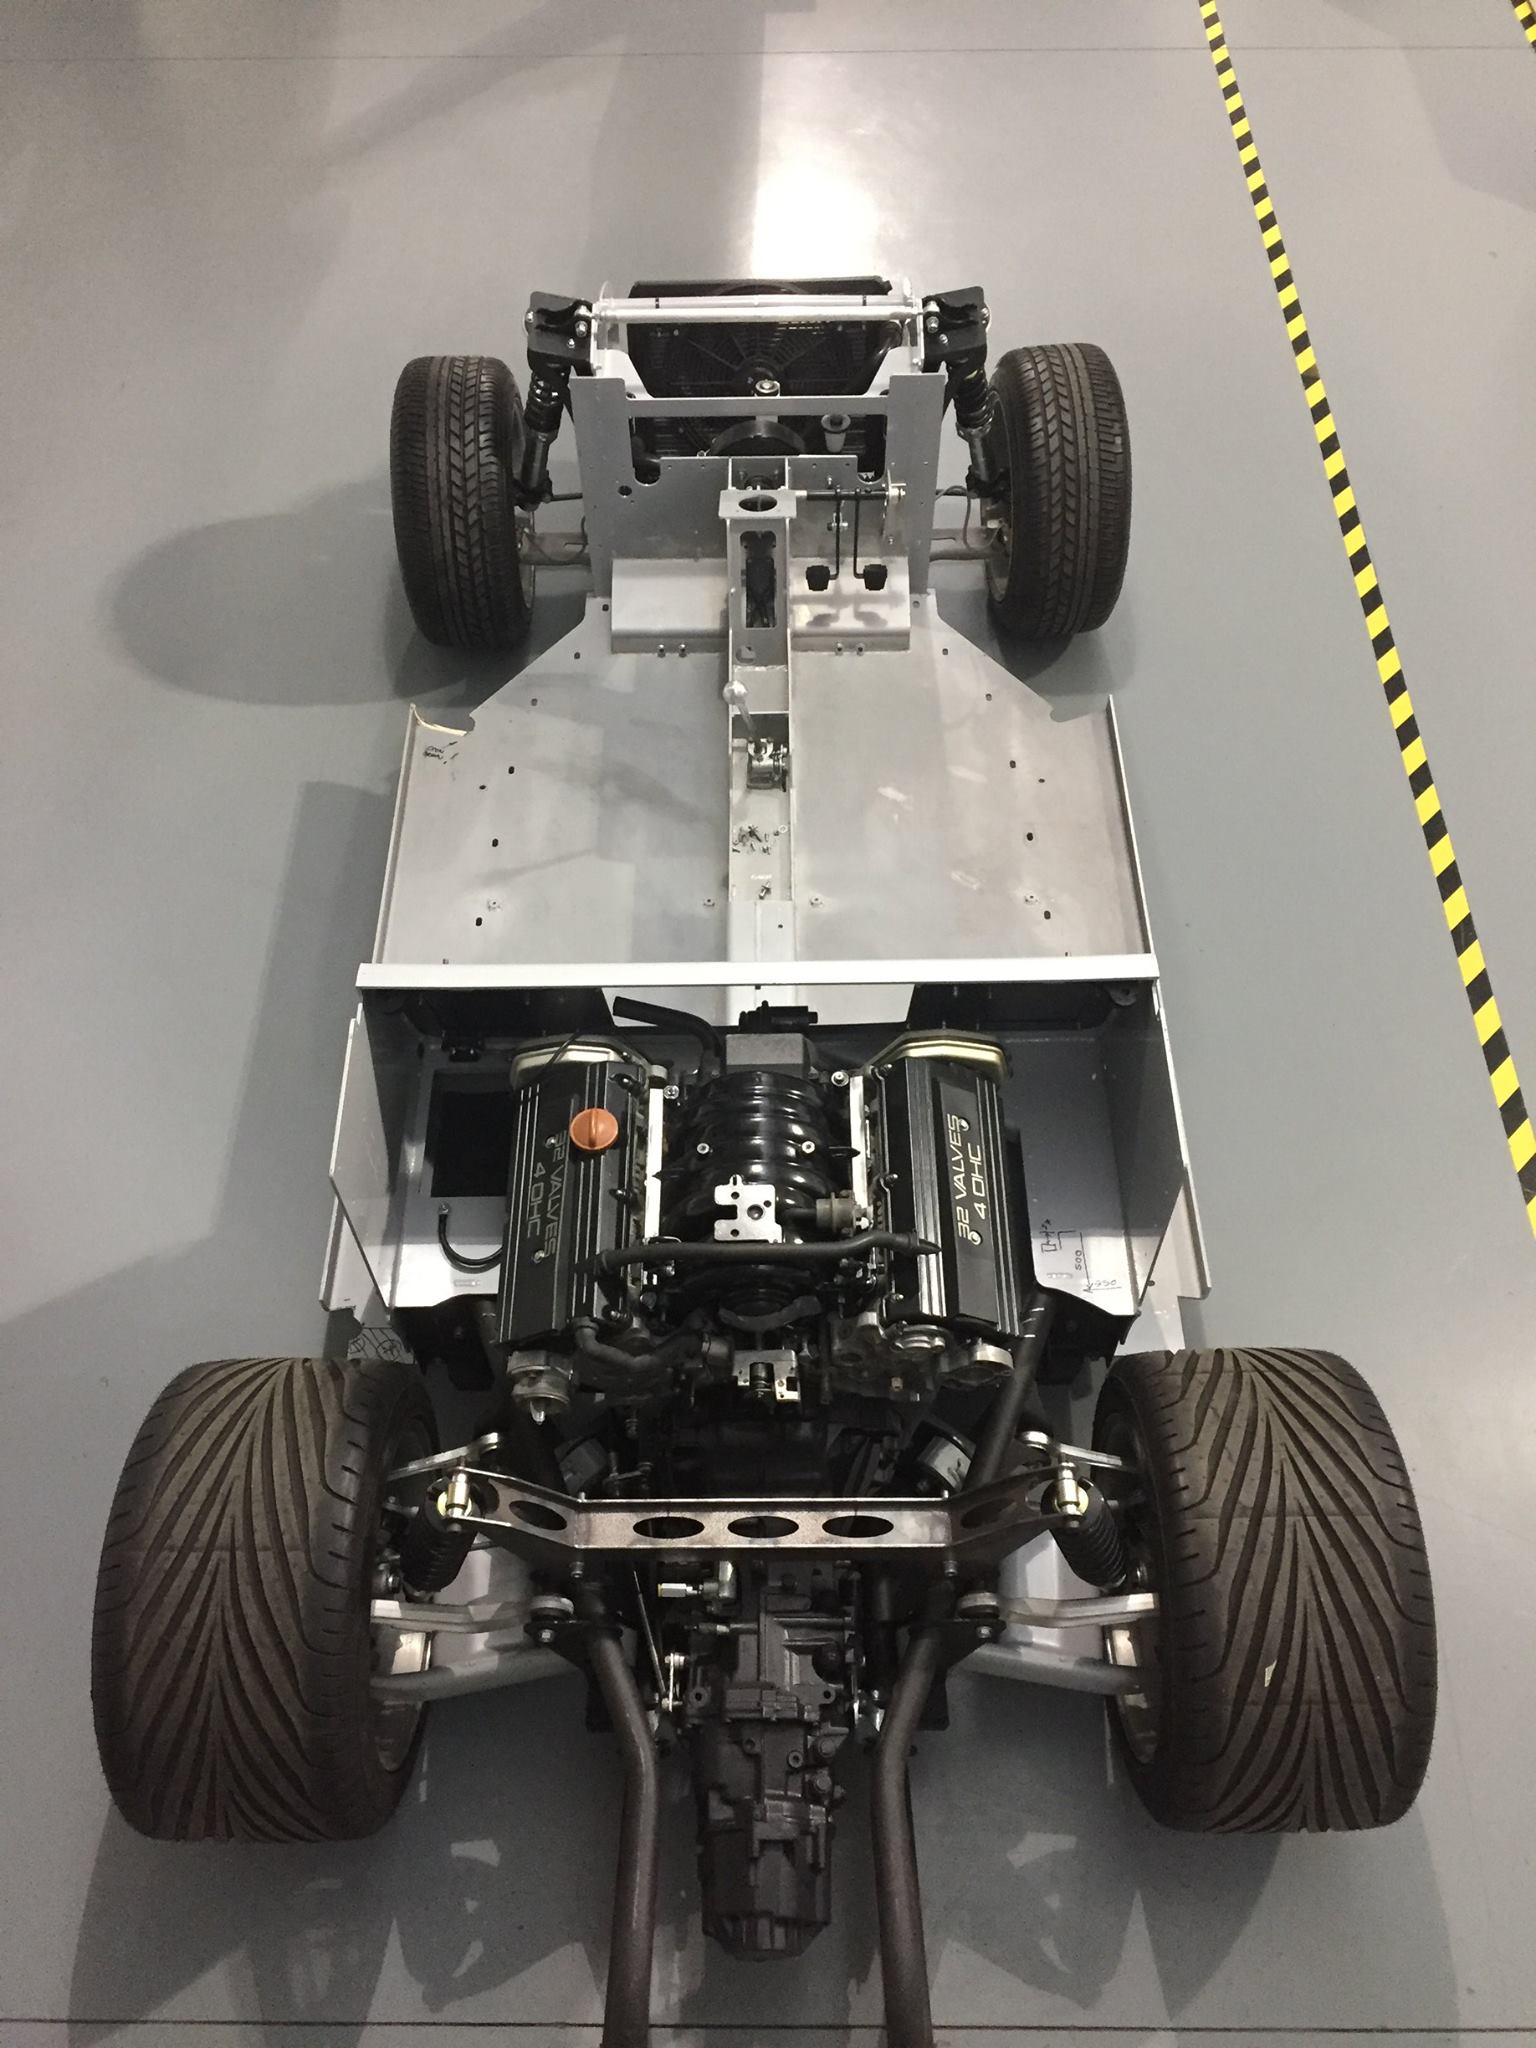 Custom Beetle With A Twin Turbo Audi 4 2 L V8 Engine